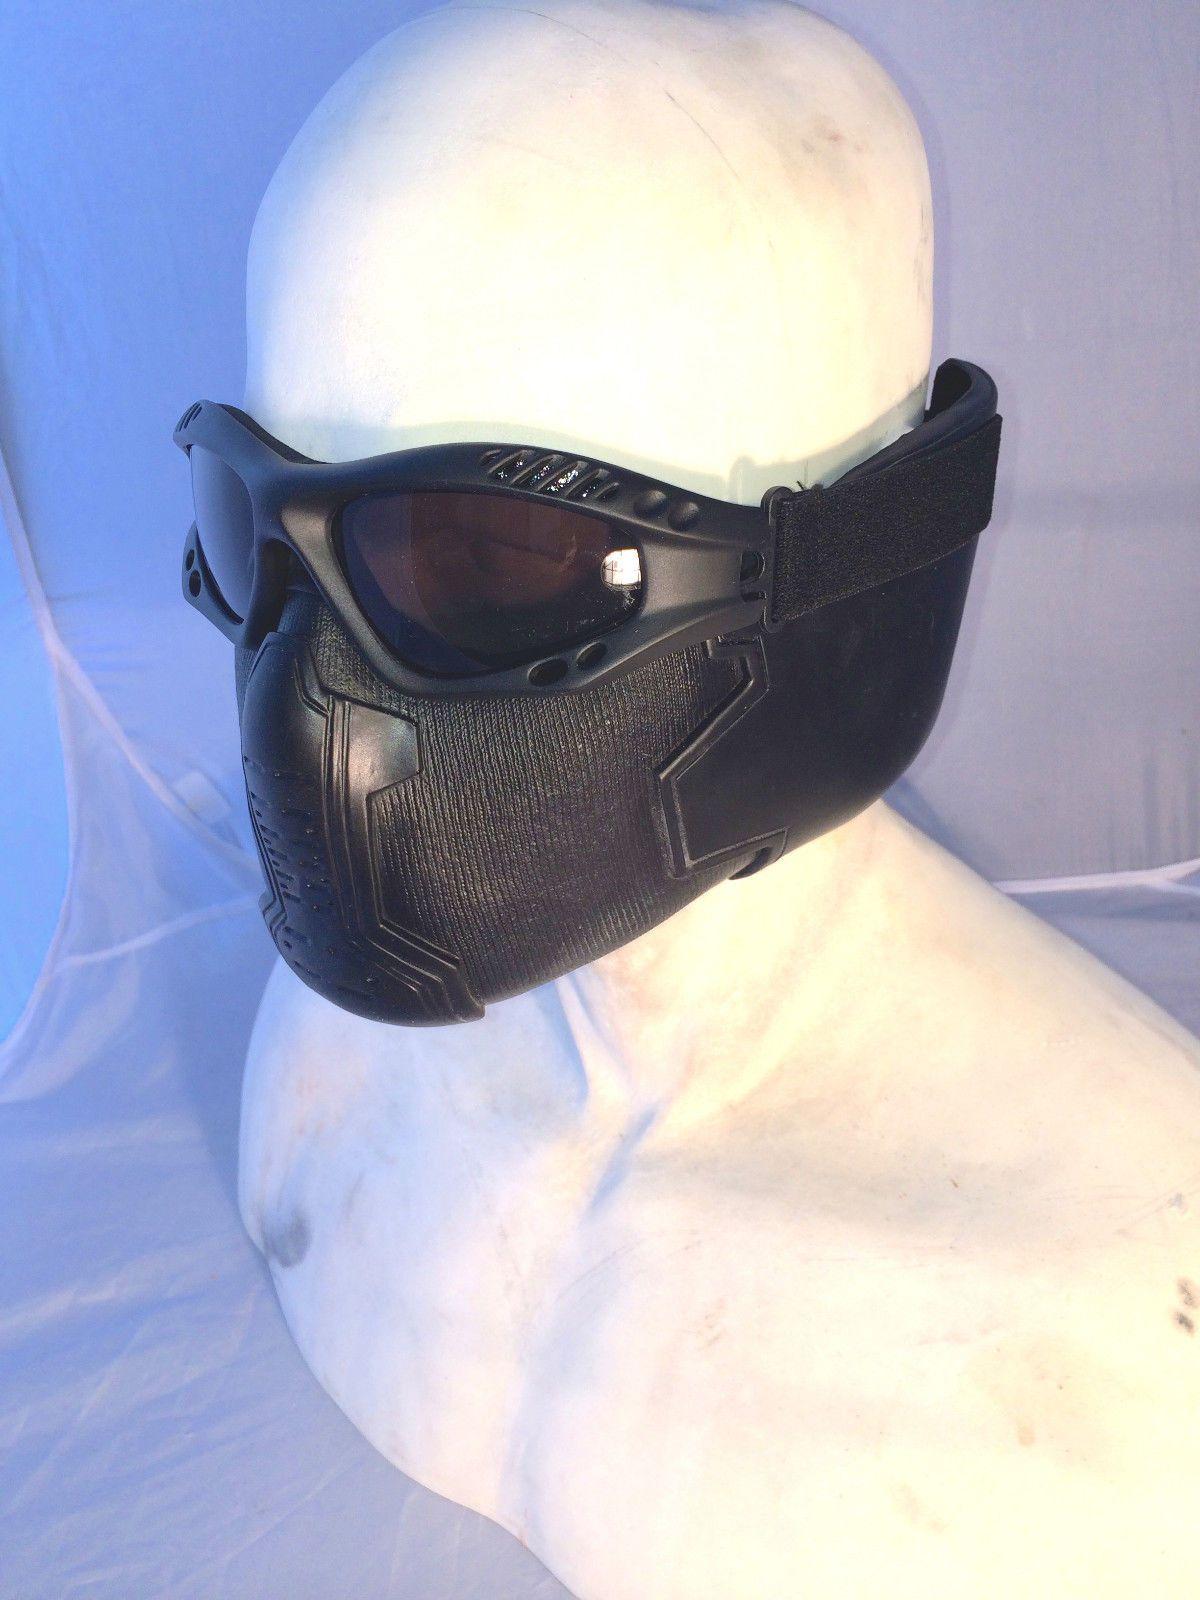 Captain America Winter Soldier Bucky Barnes Mask and Goggles | eBay